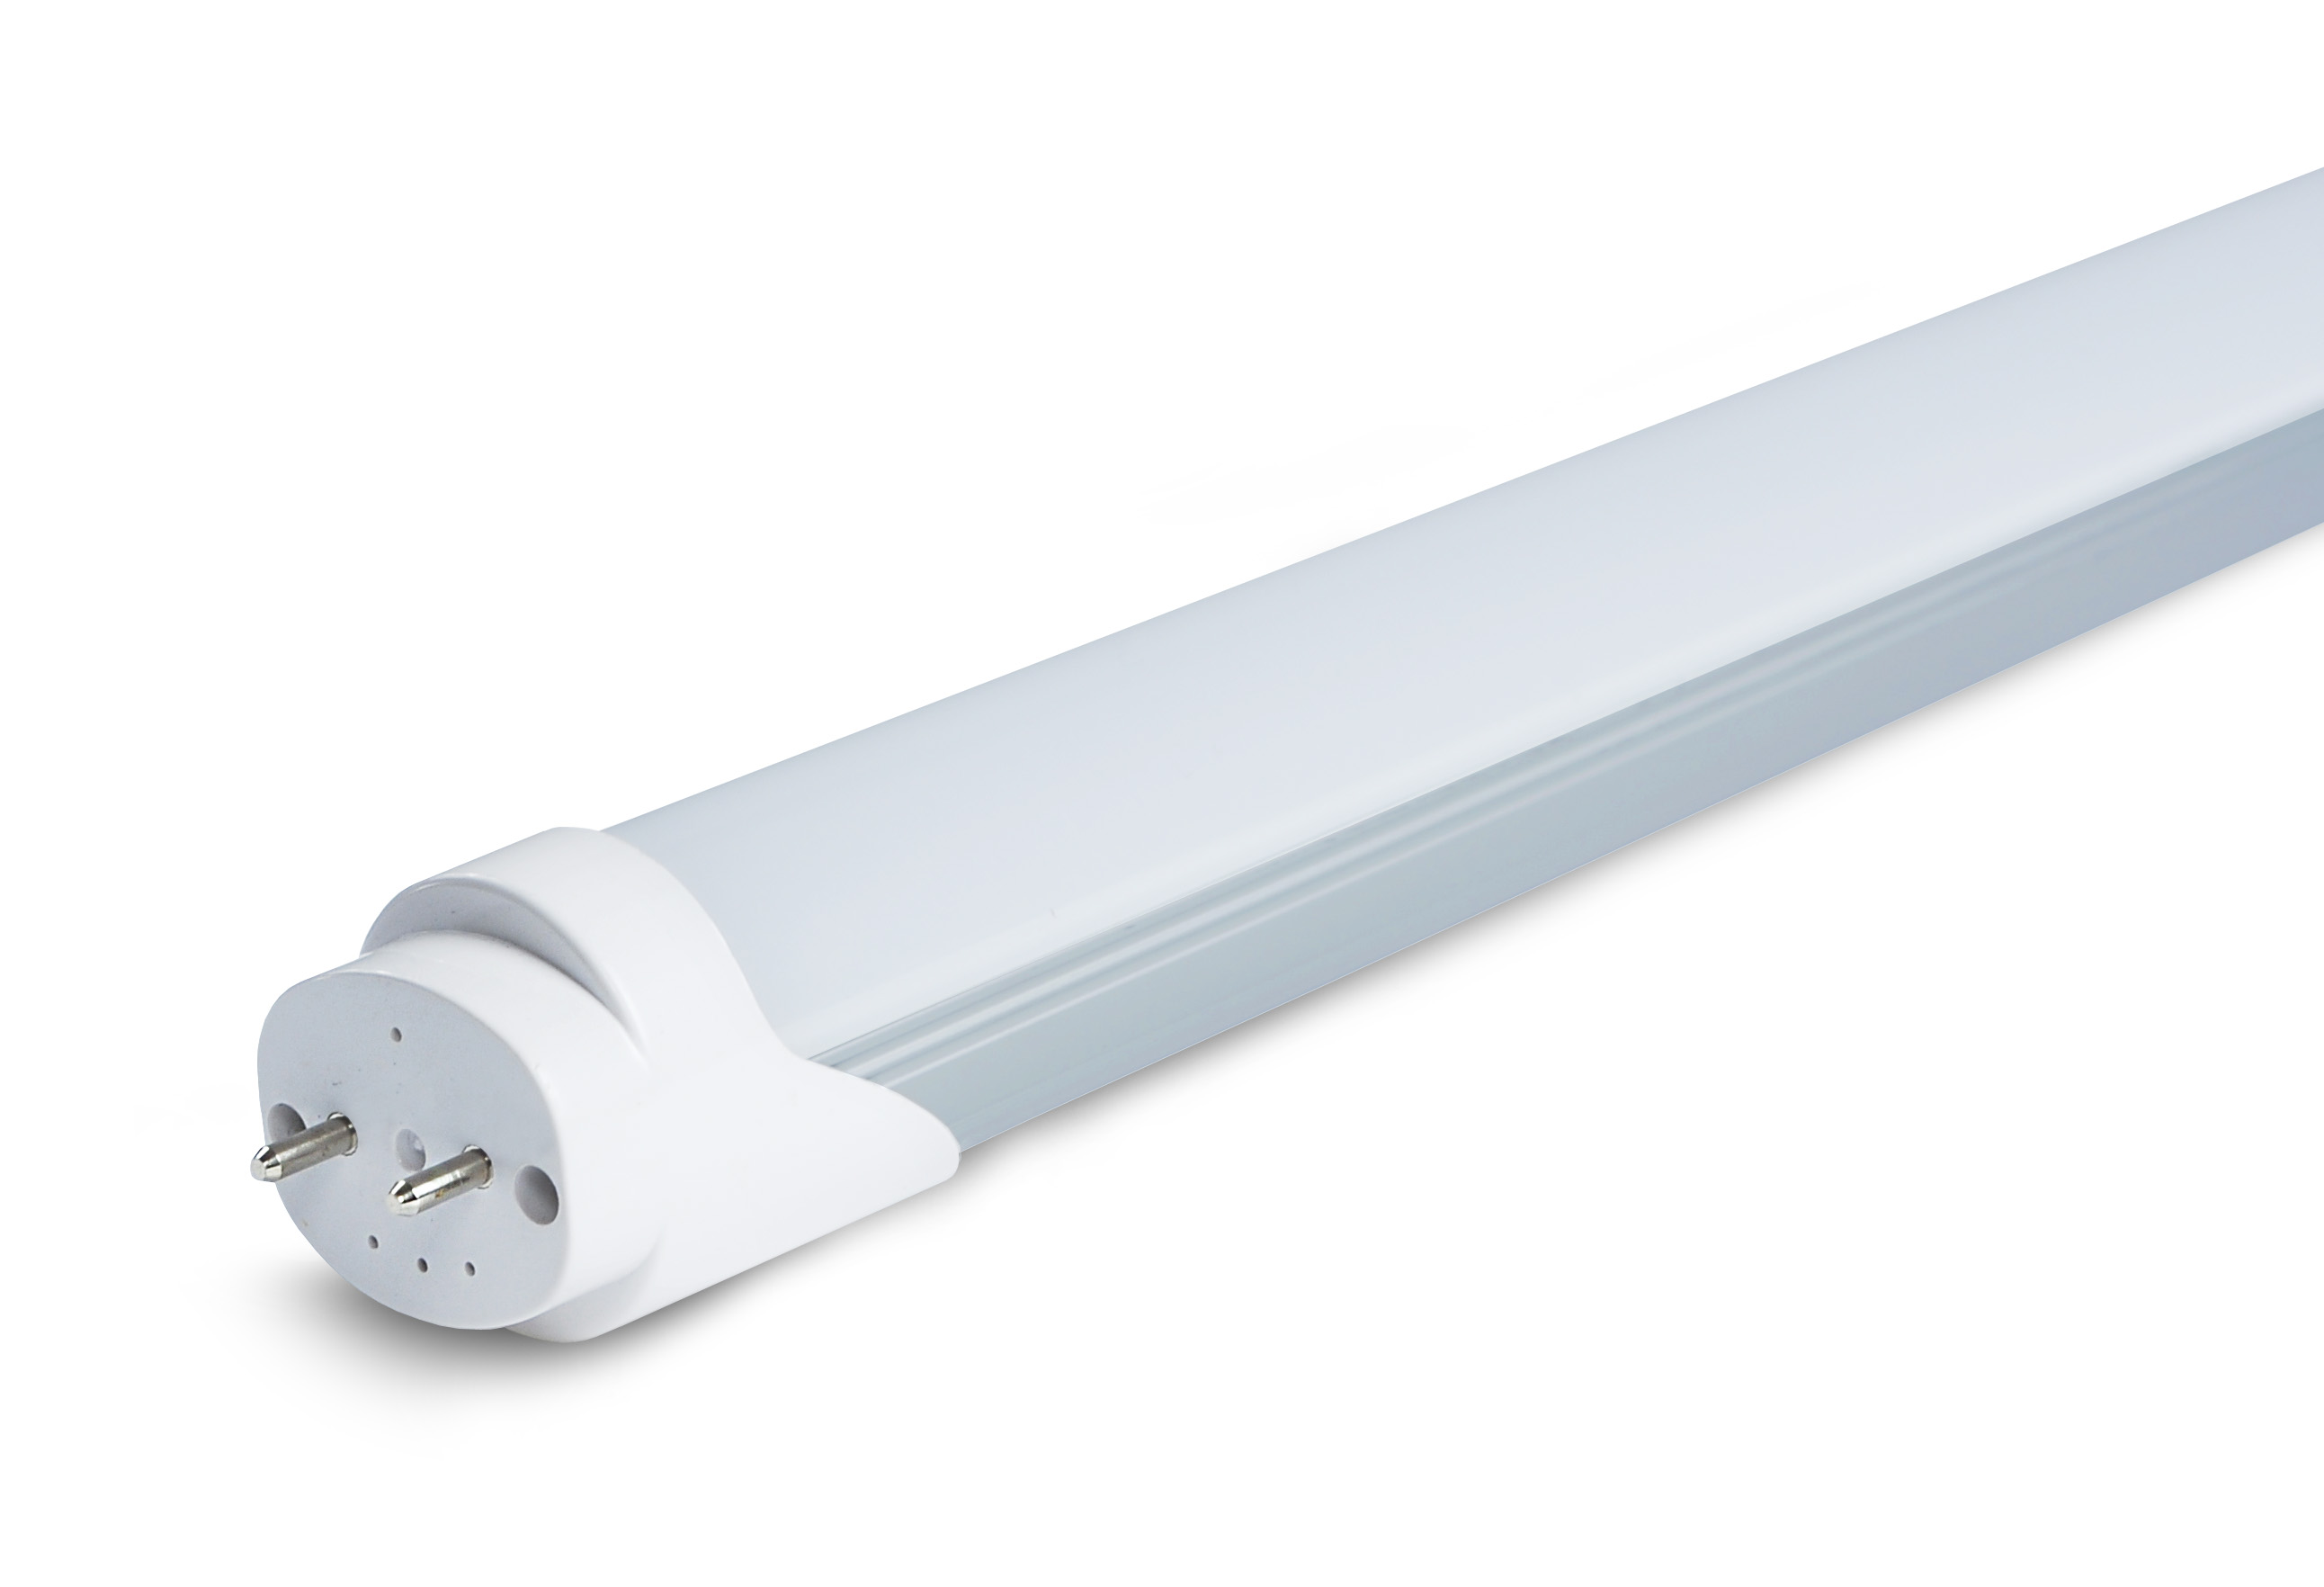 LED Solution LED žiarivka 120cm 18W 140lm/W Premium Farba svetla: Teplá biela ZAR120CM18W-TB